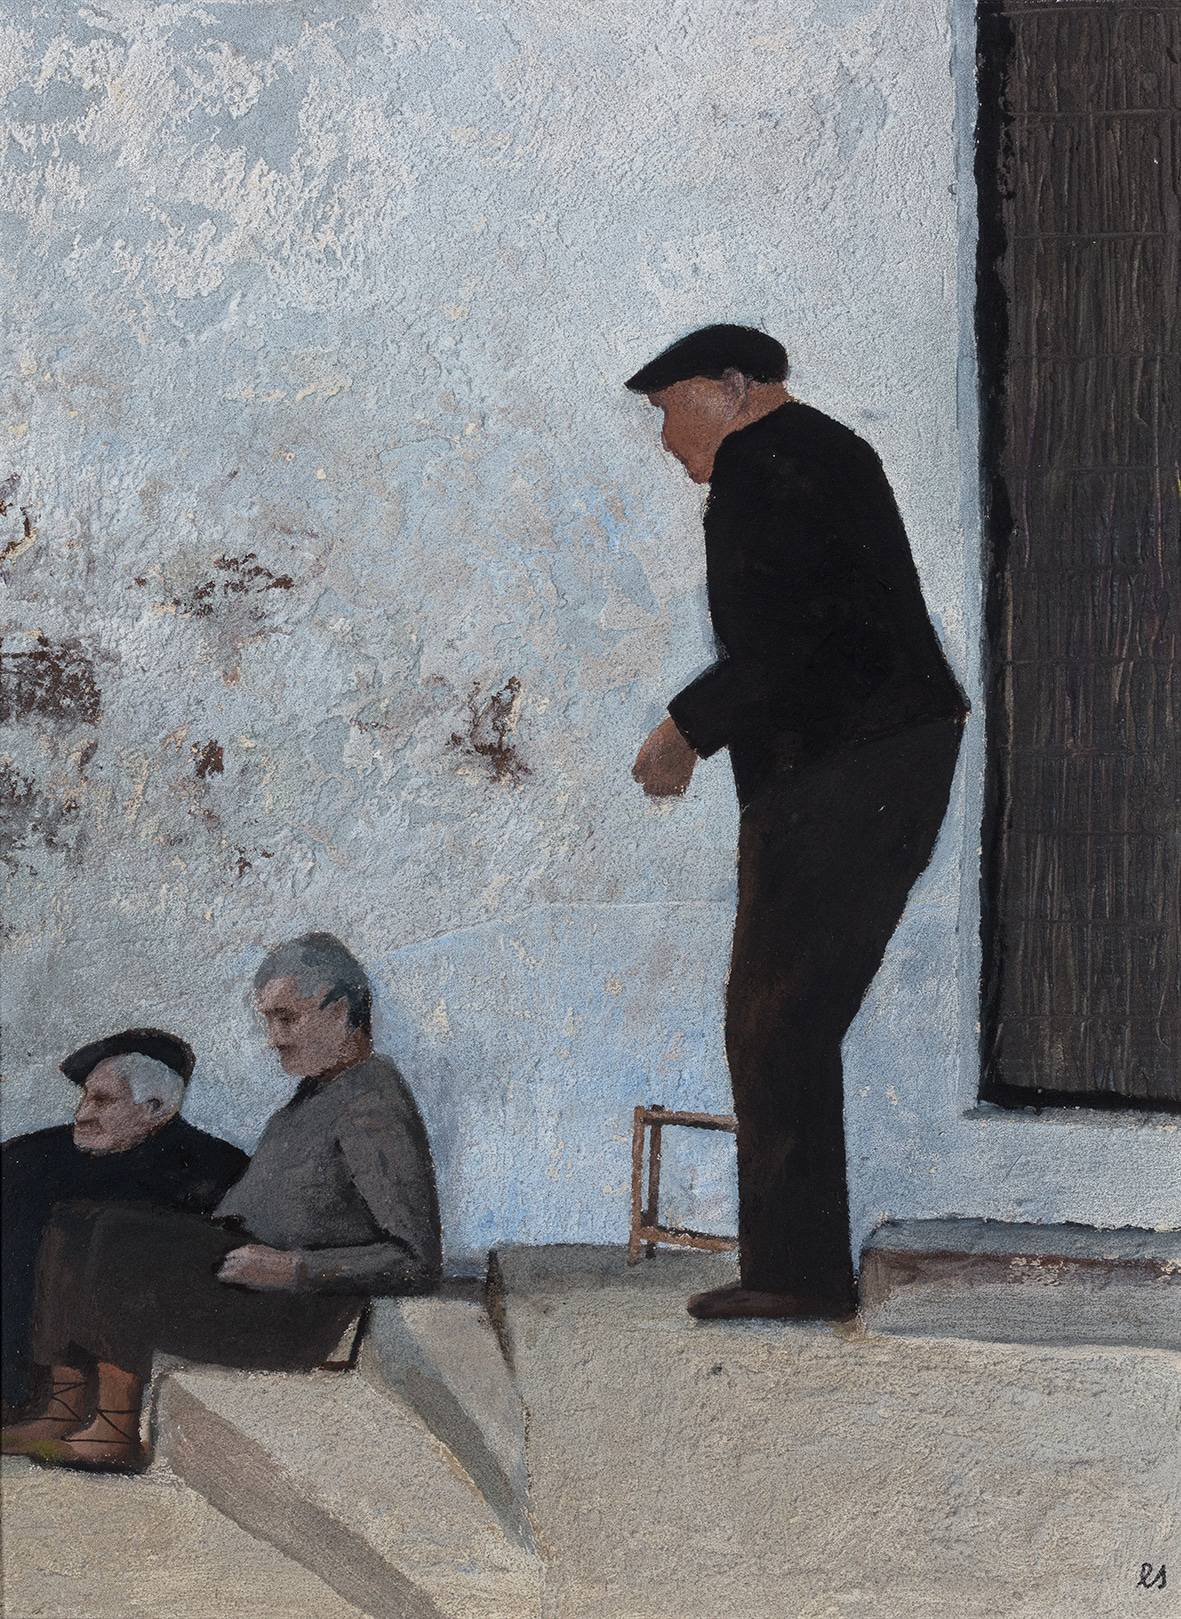 Eberhard Schlotter Los viejos de Bollula, 2002 © Bomann-Museum, Celle